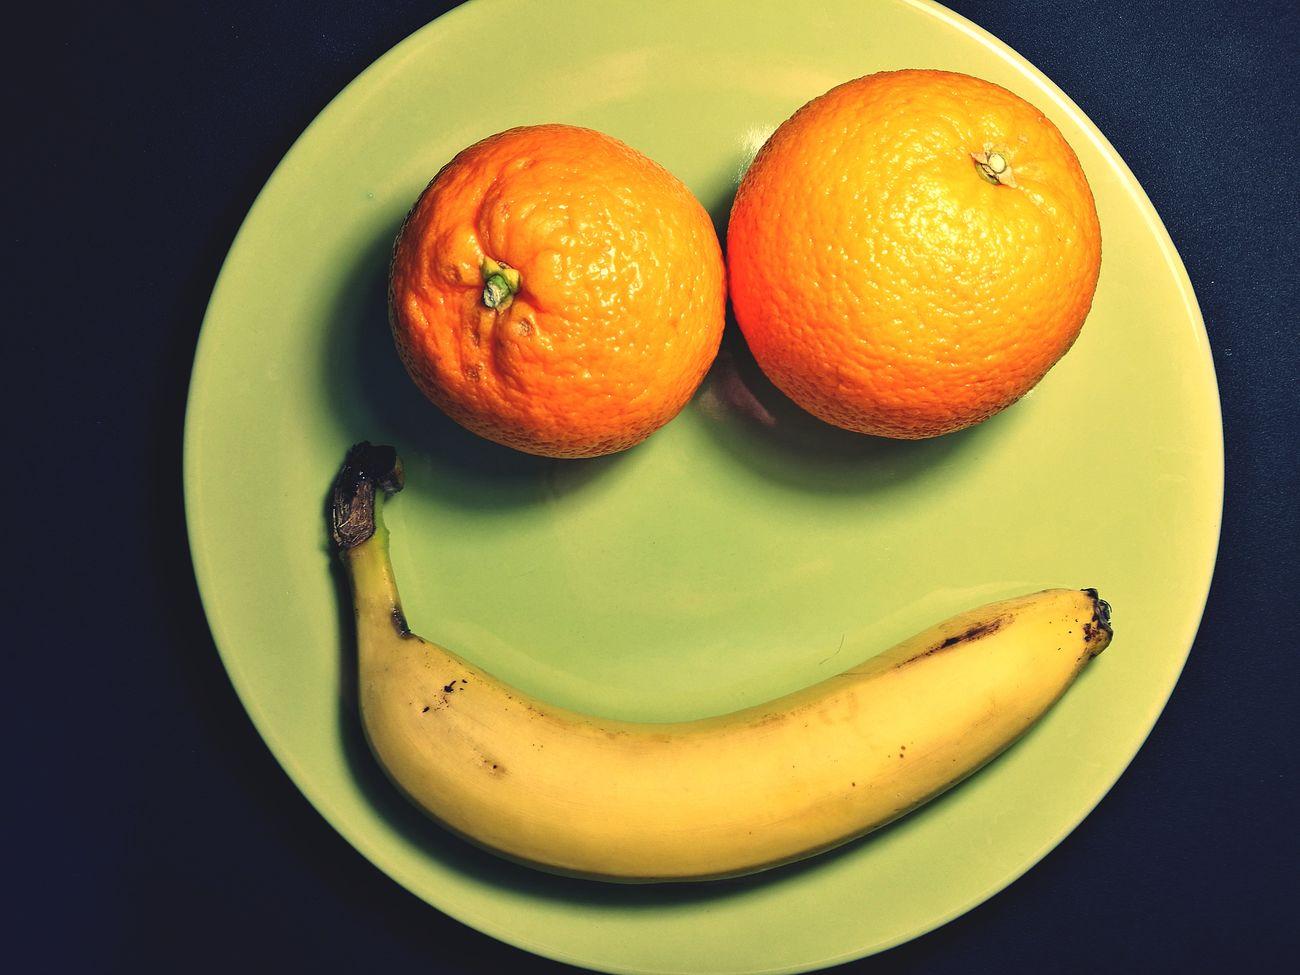 Smile Keep Smiling Have A Nice Day! Fruit Fruits Orange Oranges Orange Color Banana Food Freshness Orange - Fruit Plate Citrus Fruit Ready-to-eat Close-up No People Indoors